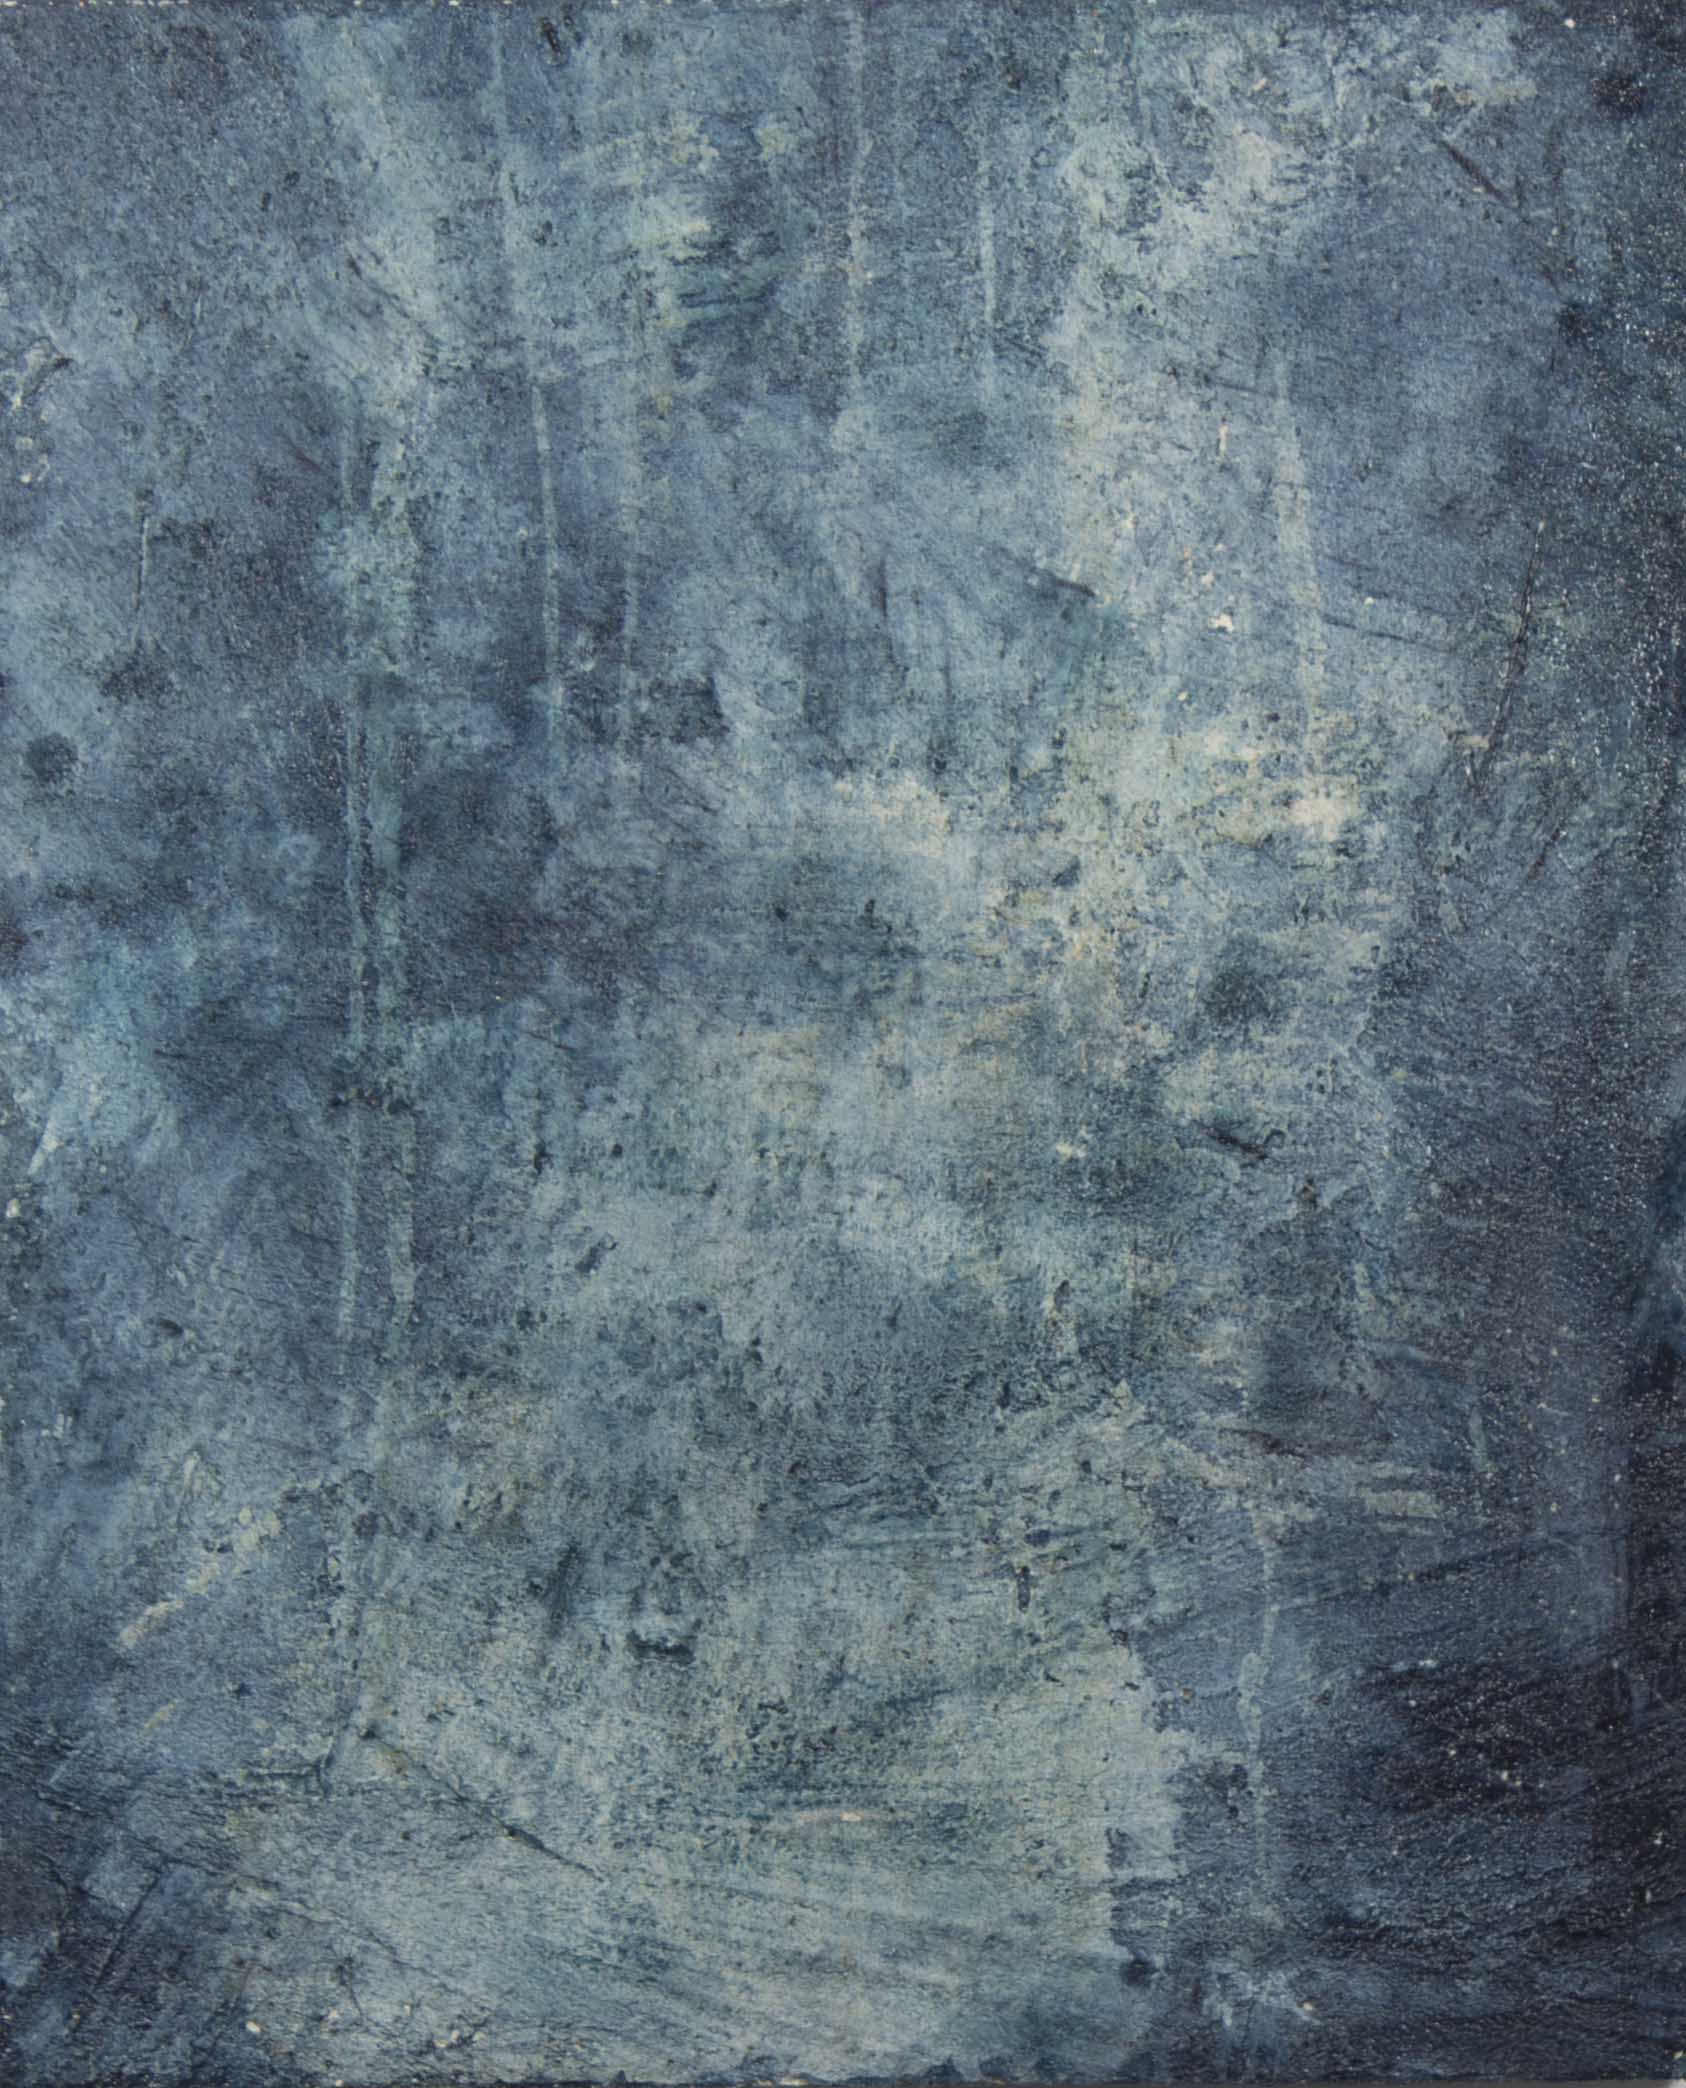 Plaster on Panel, Natural Pigment Glaze  15' X 20', 2018